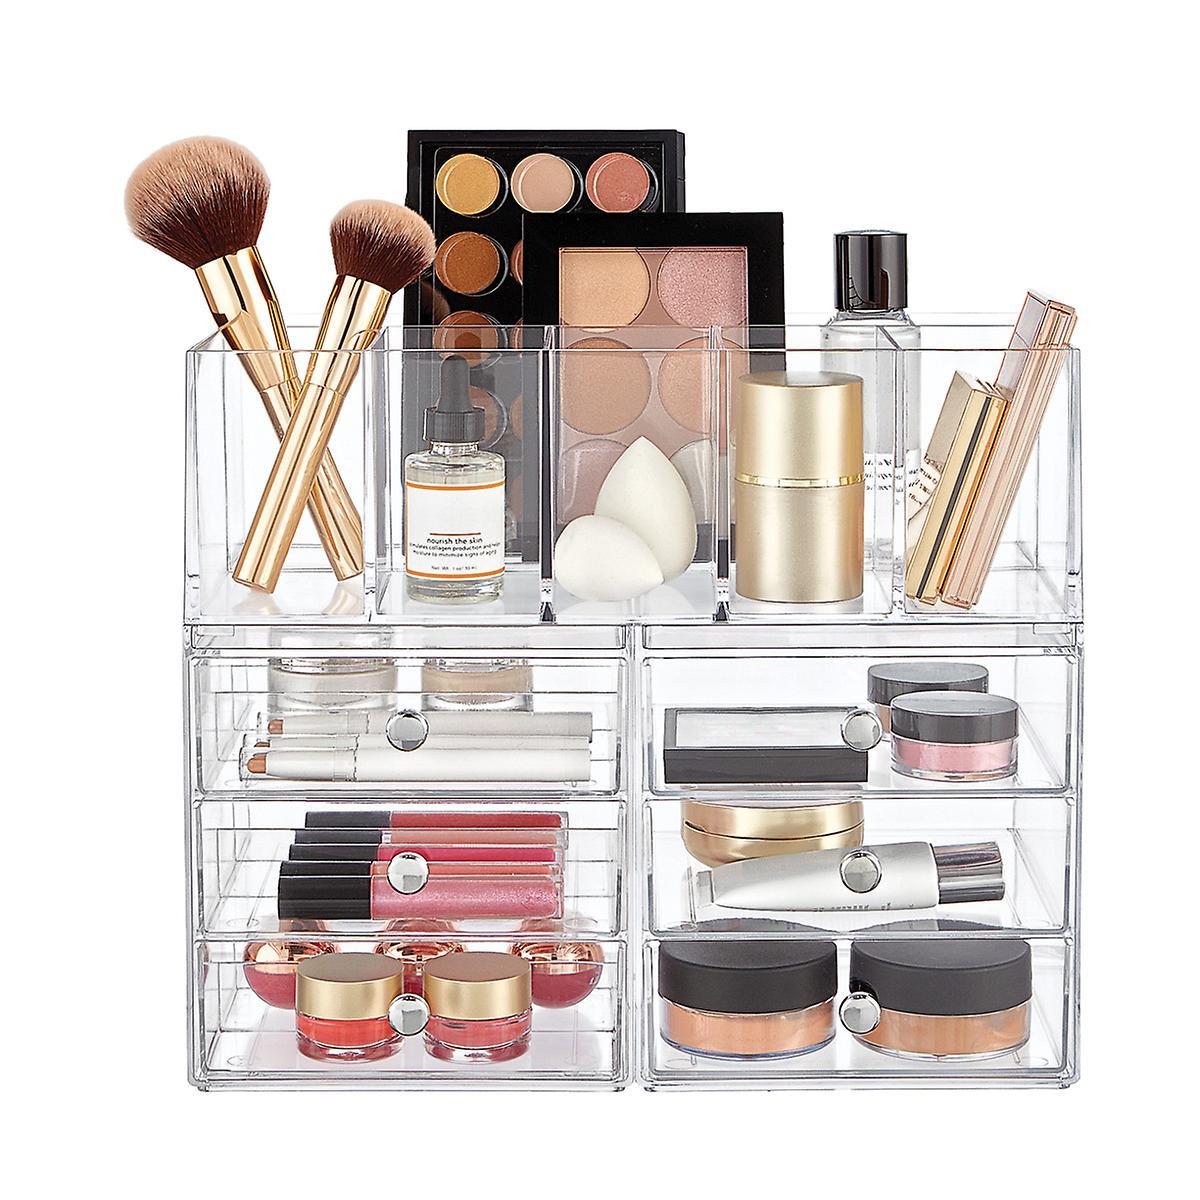 InterDesign Clarity Makeup Storage Starter Kit